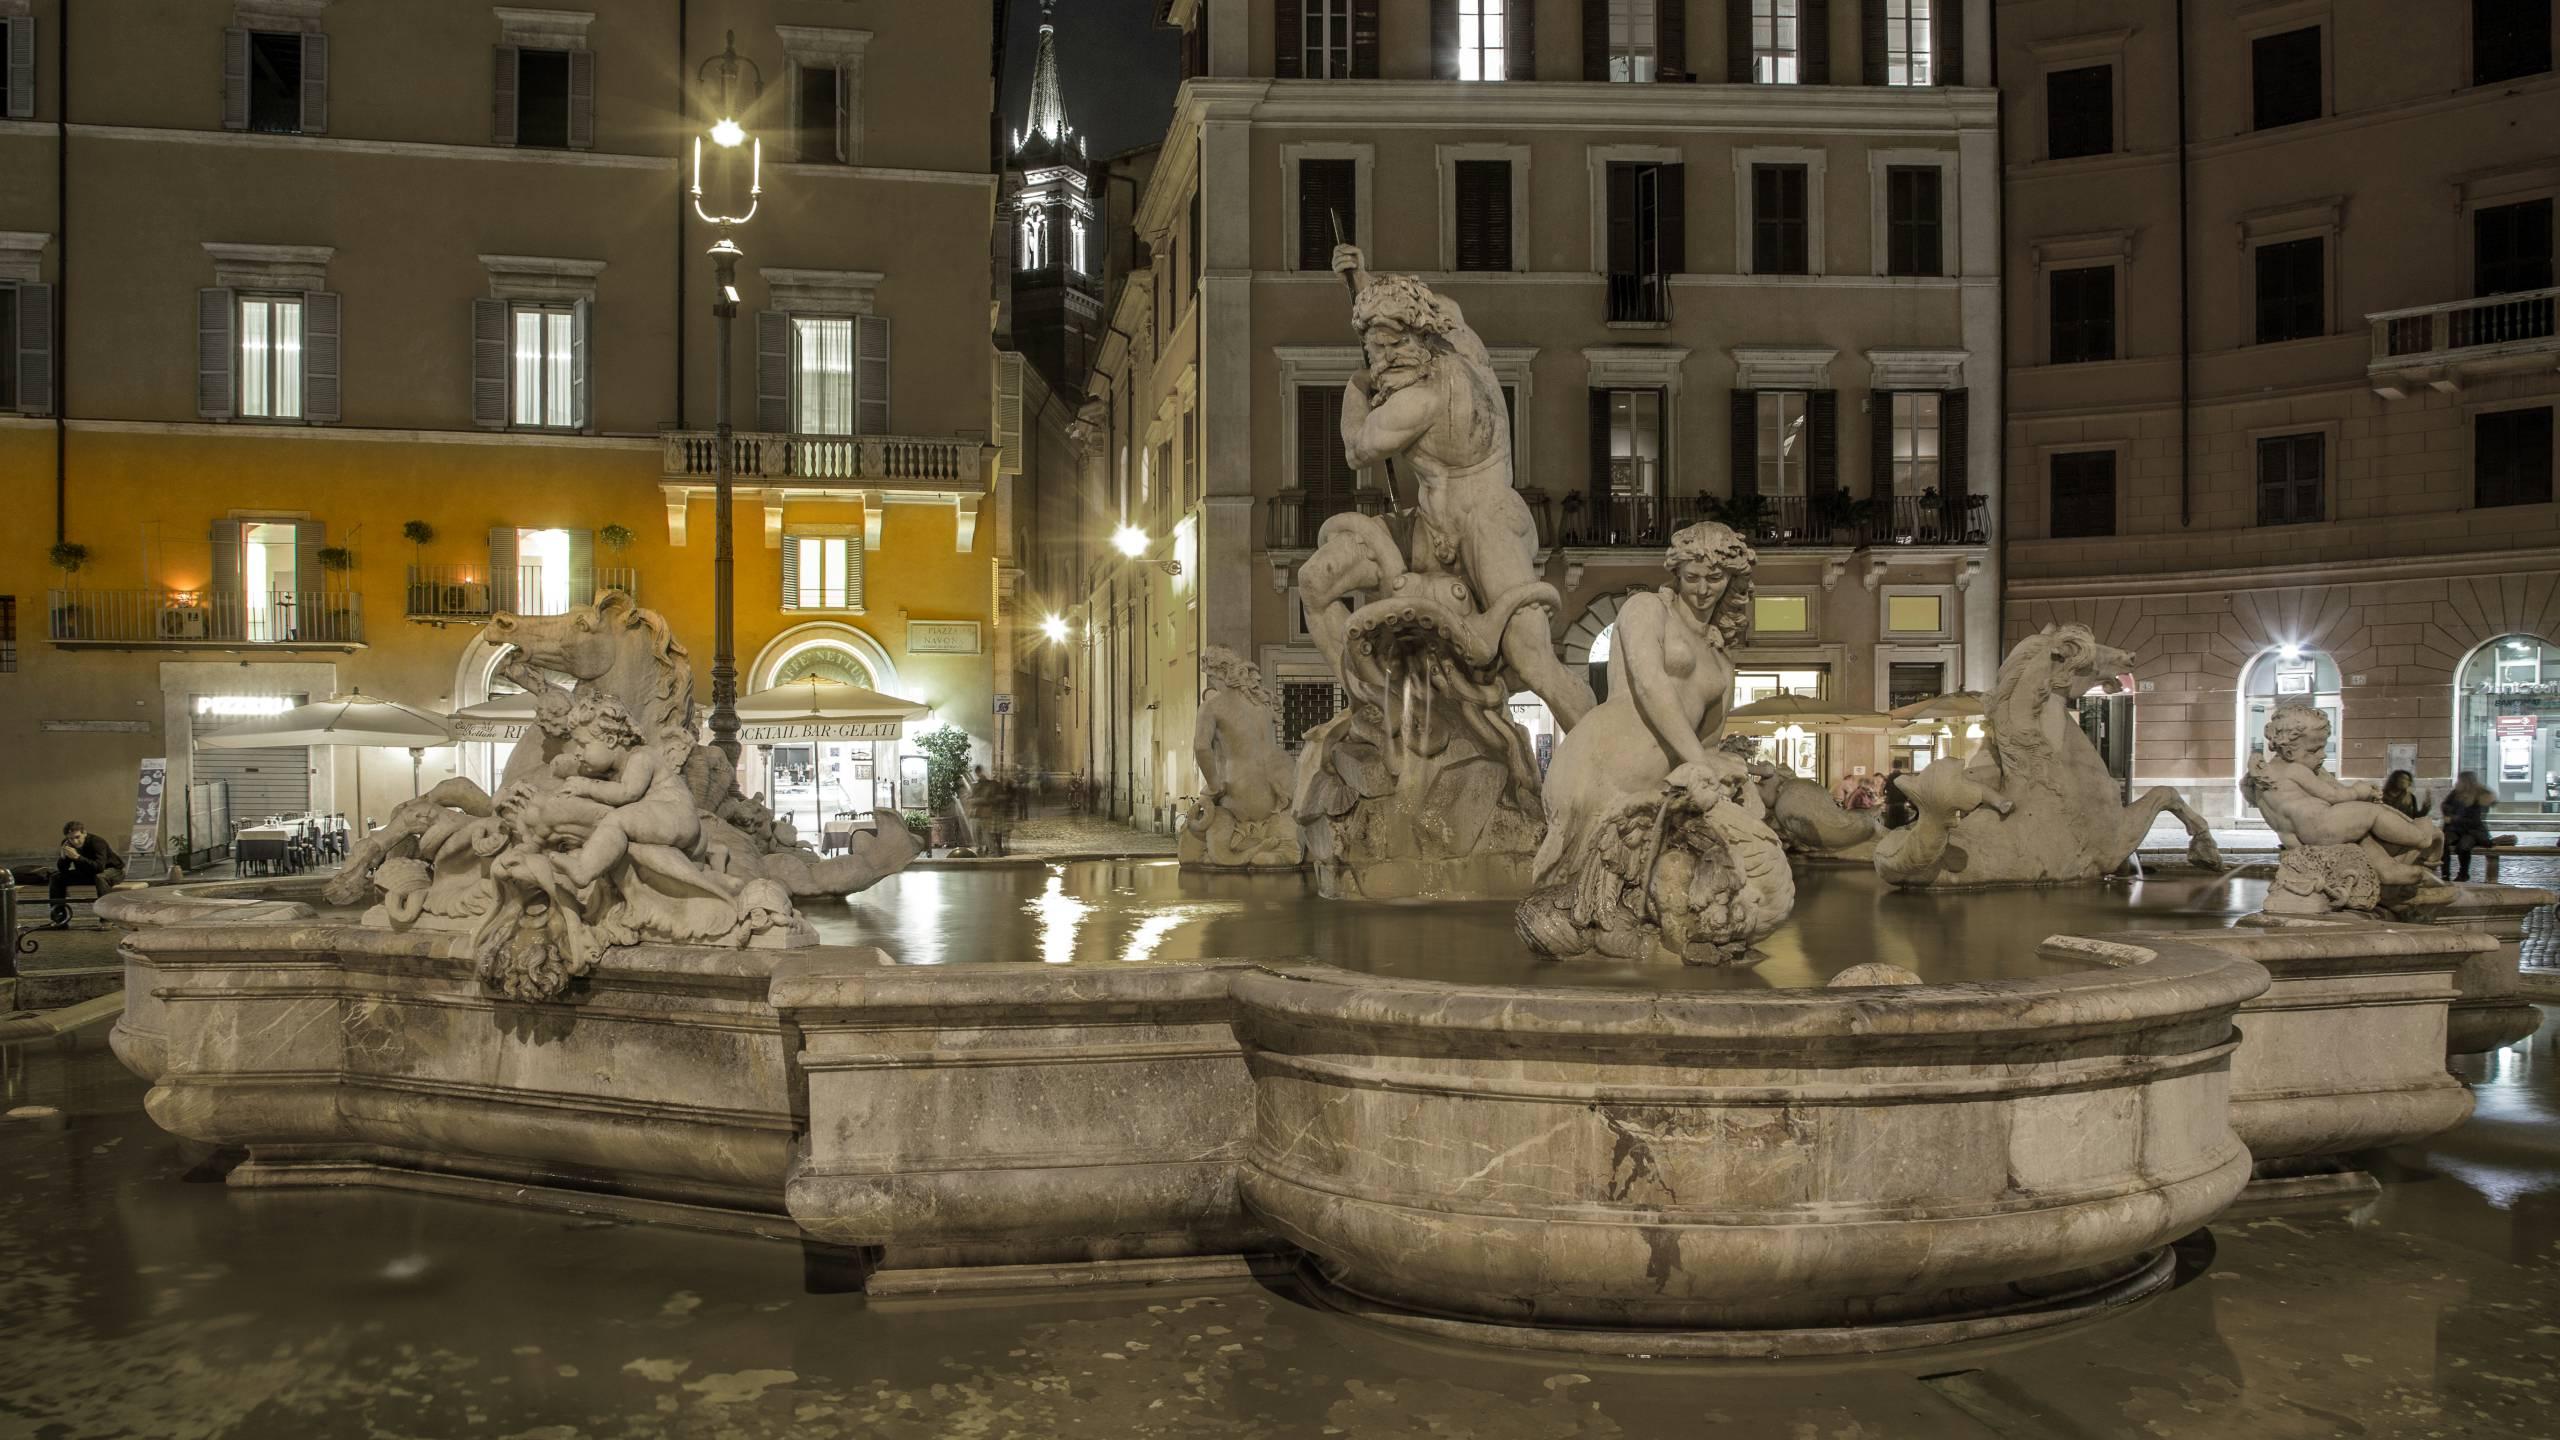 palazzo-de-cupis-roma-piazza-navona4